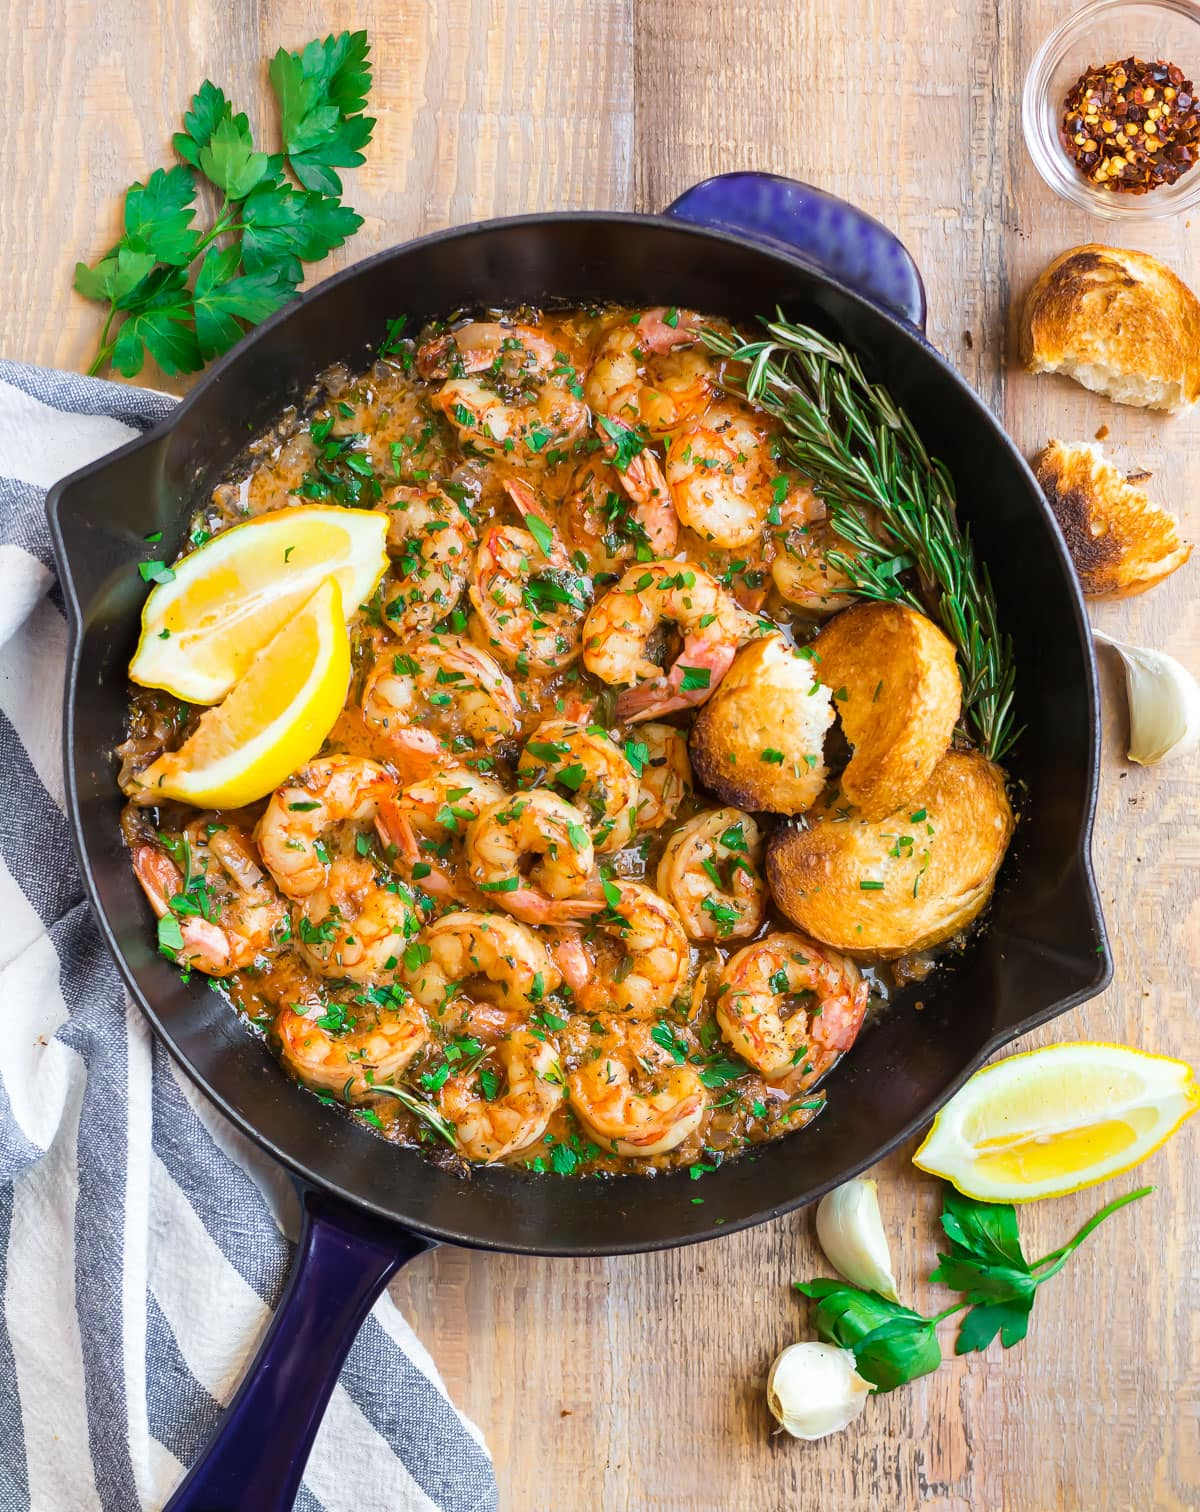 A skillet with Garlic Butter Shrimp